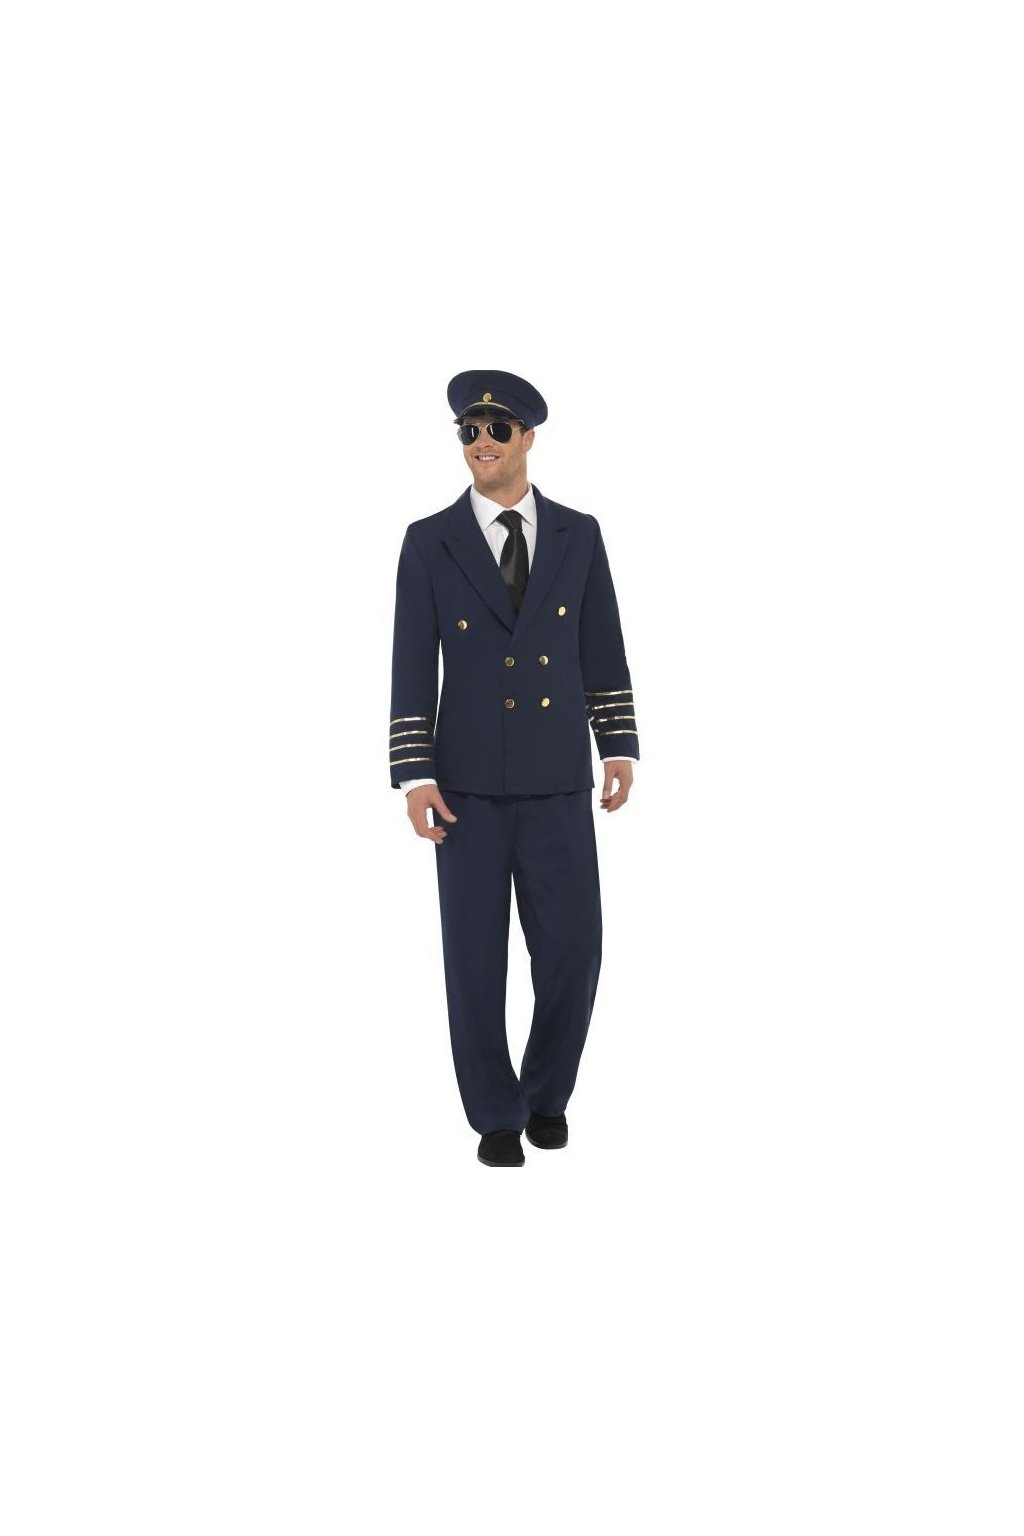 Pilot - pánský kostým